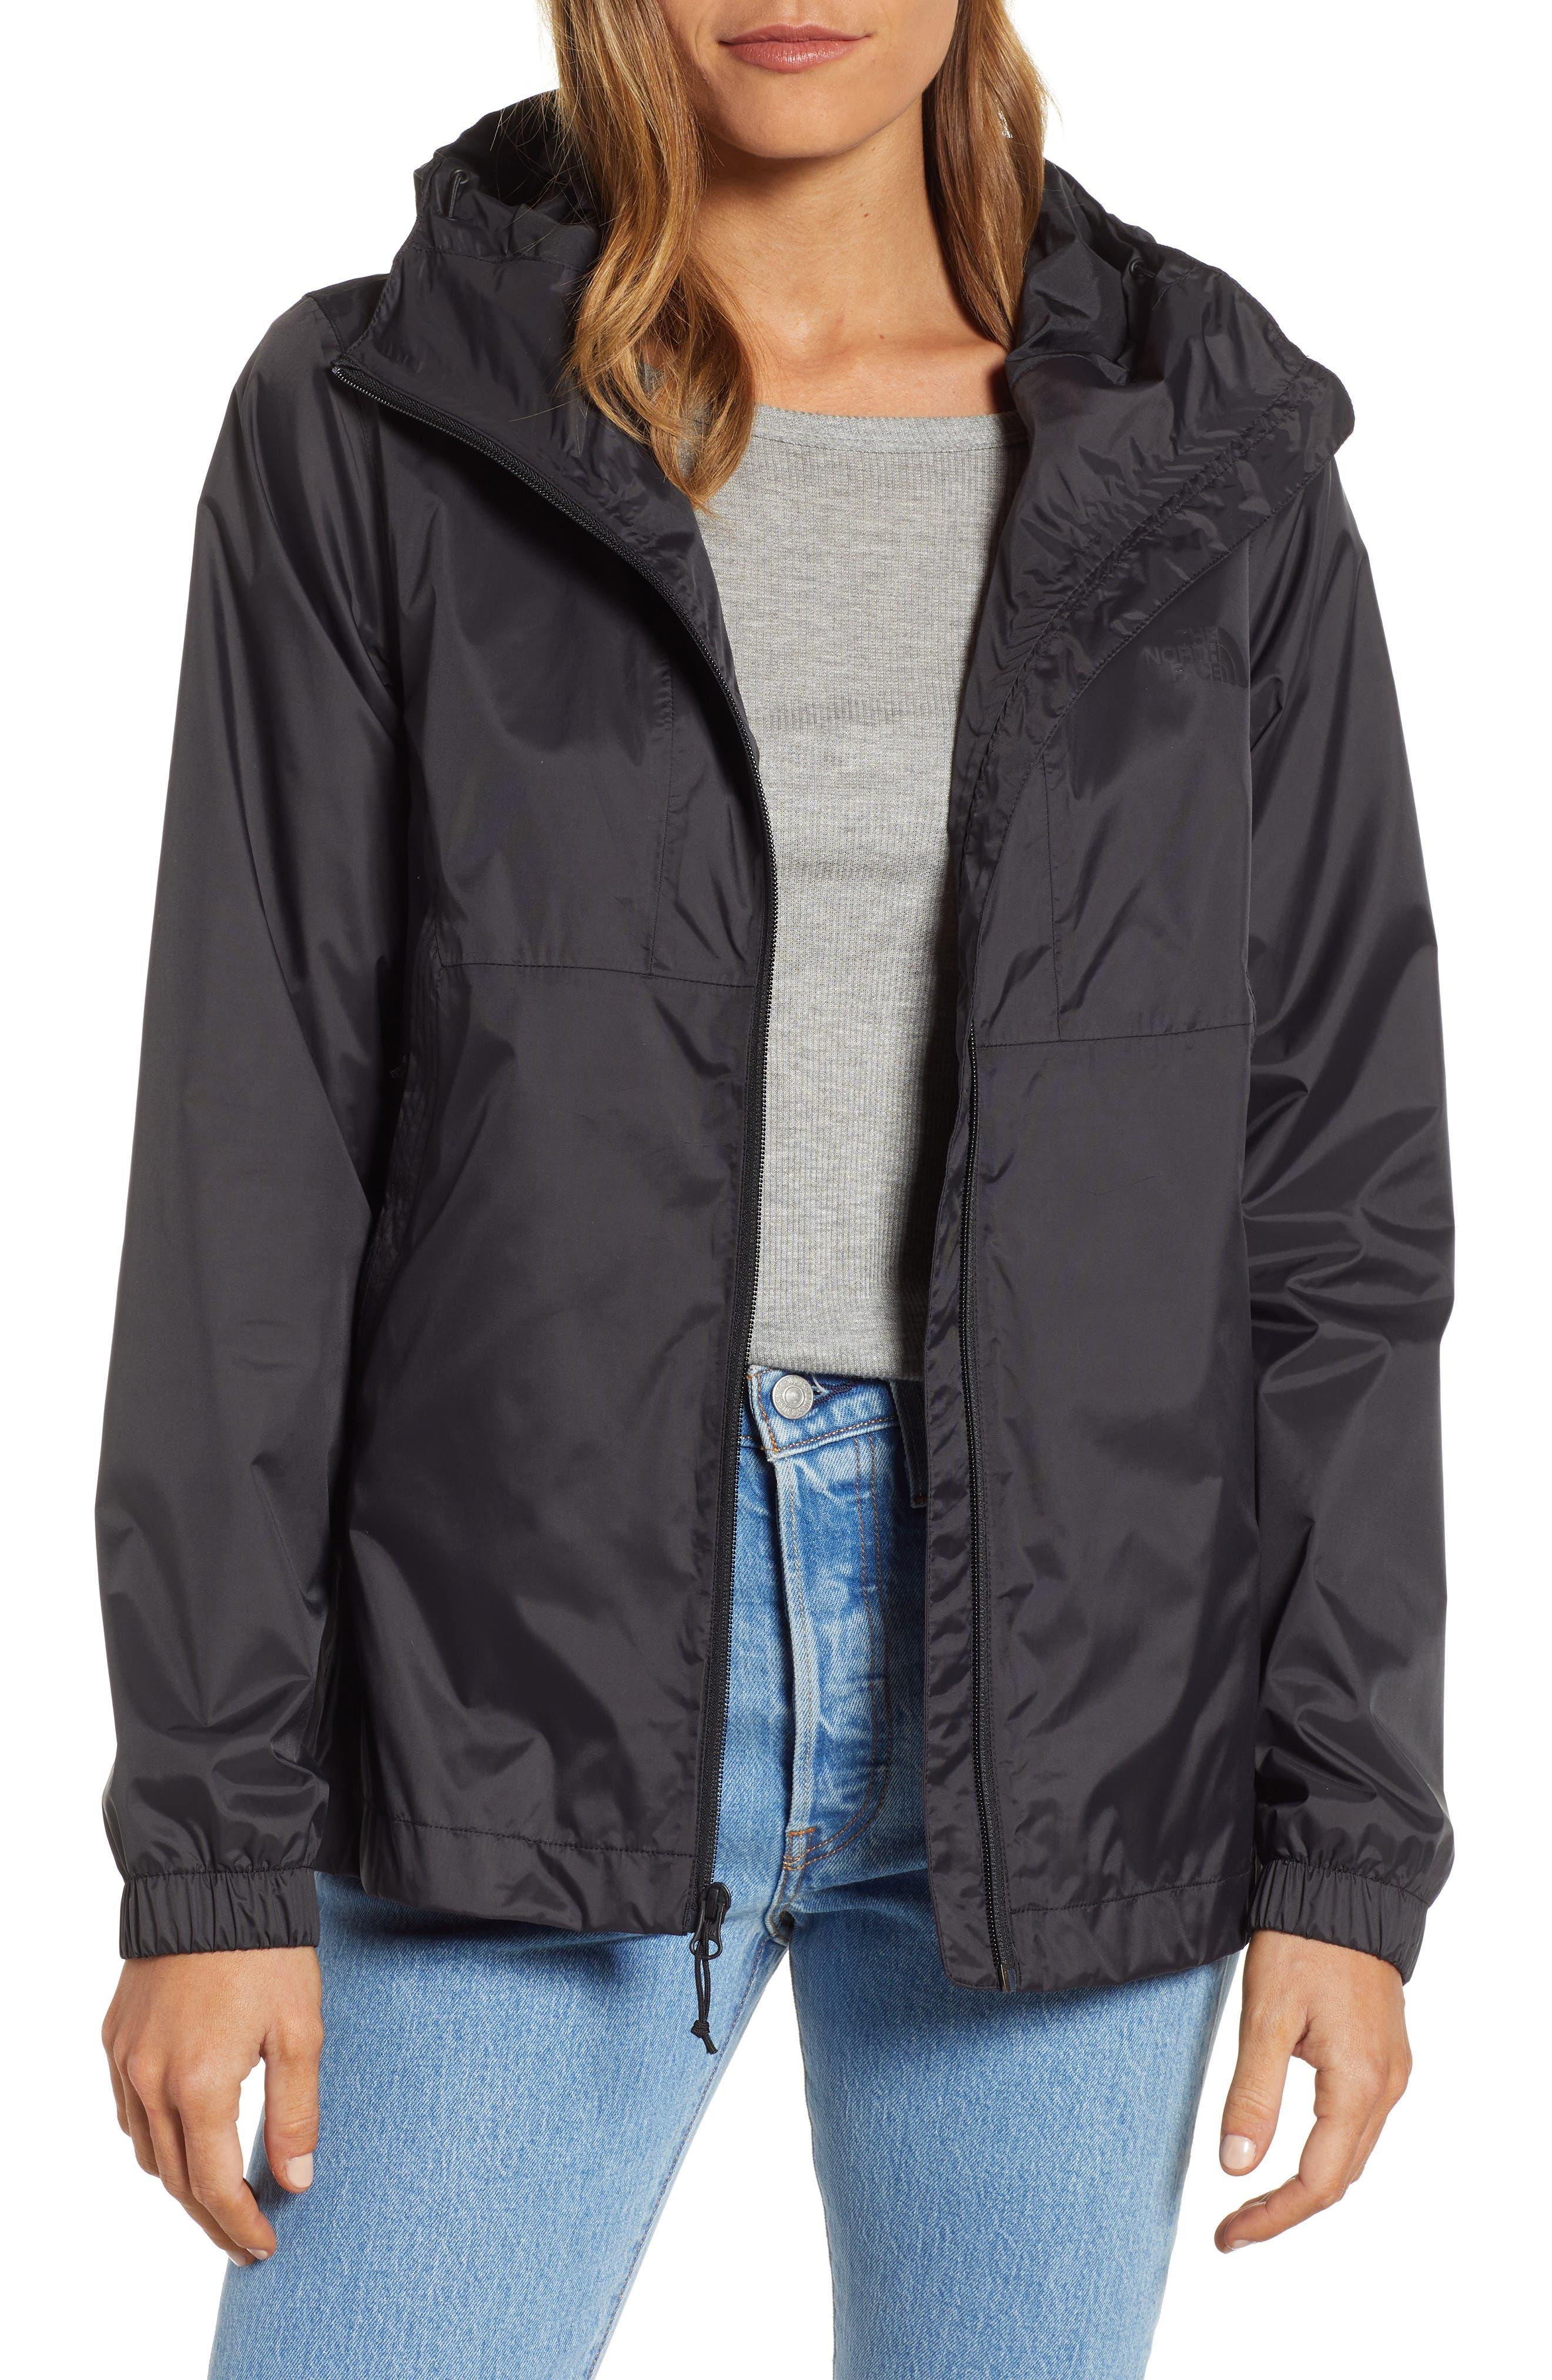 The North Face Phantastic Waterproof/windproof Rain Jacket